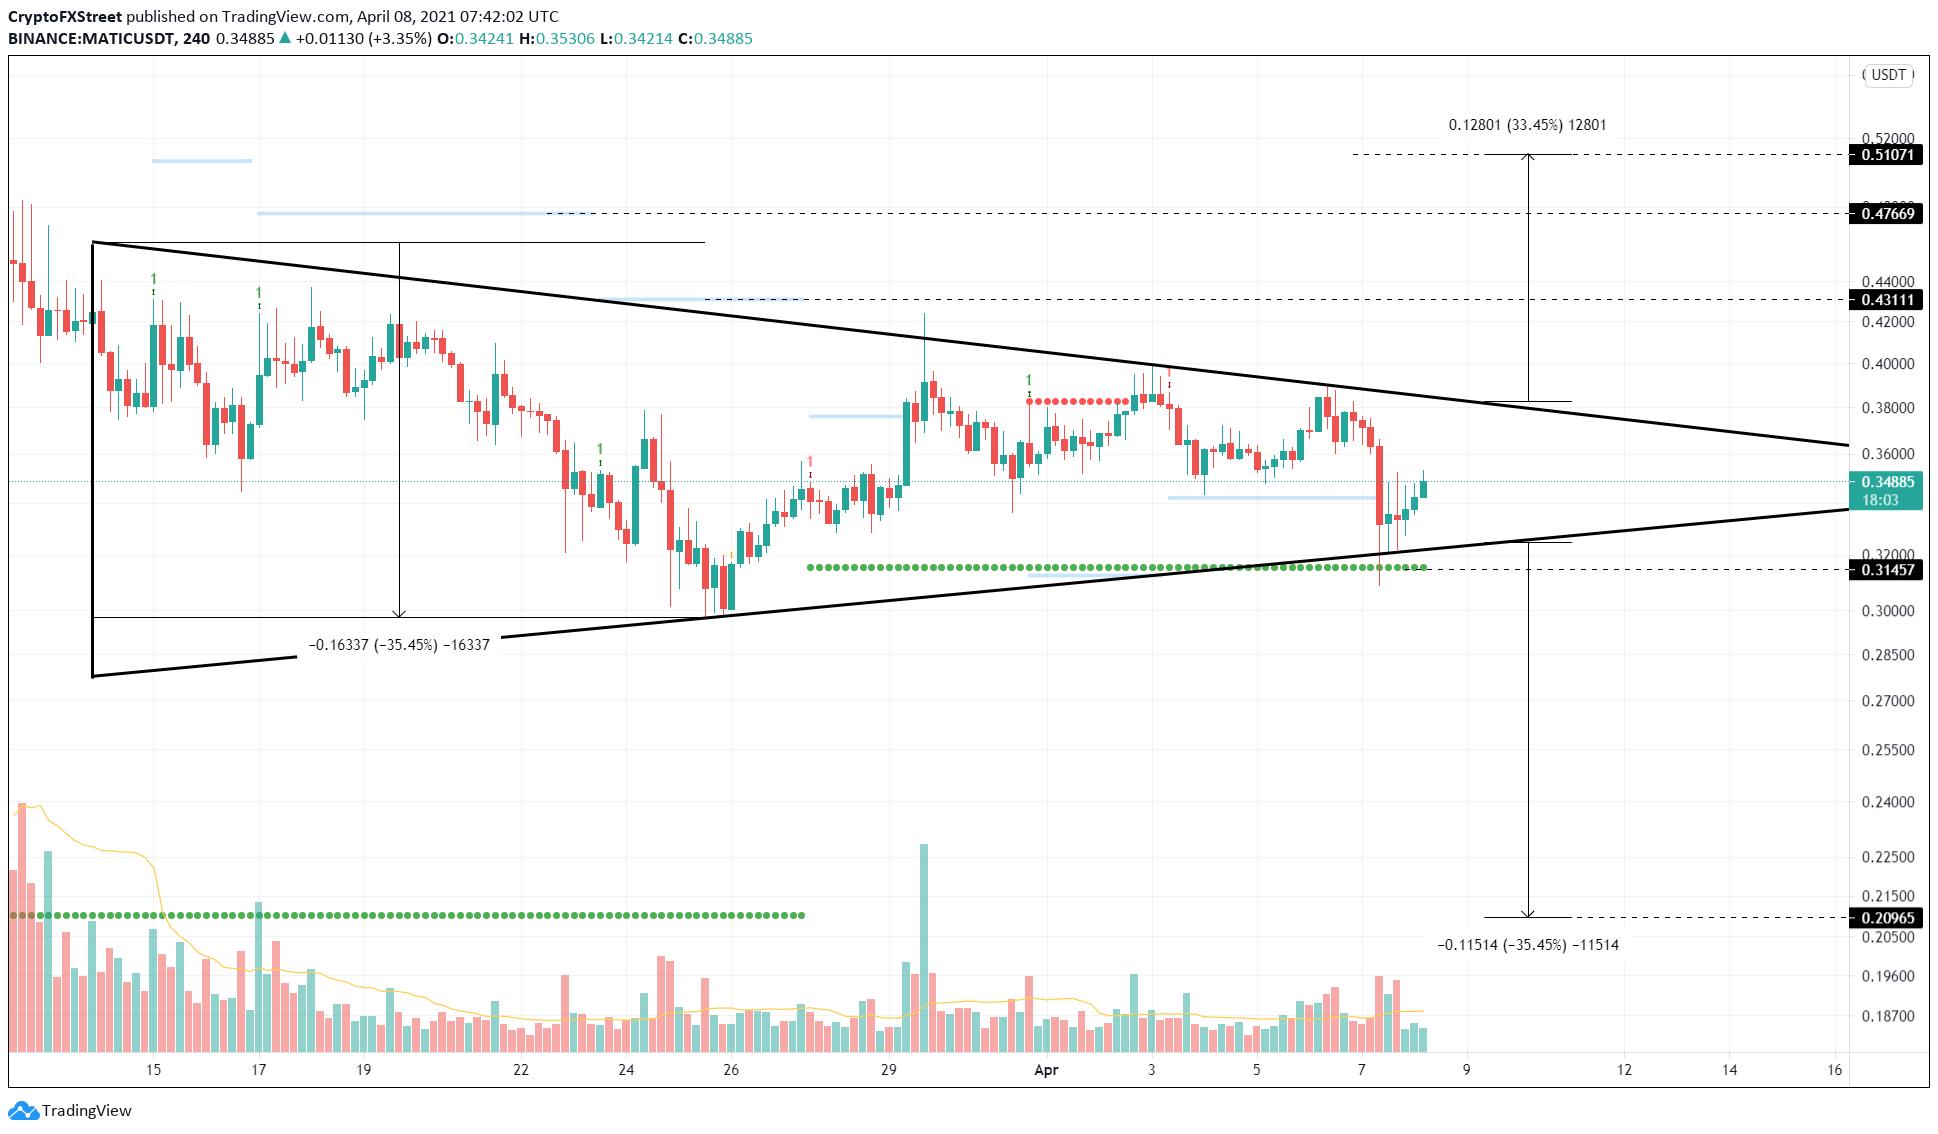 MATIC/USDT 4-hour chart